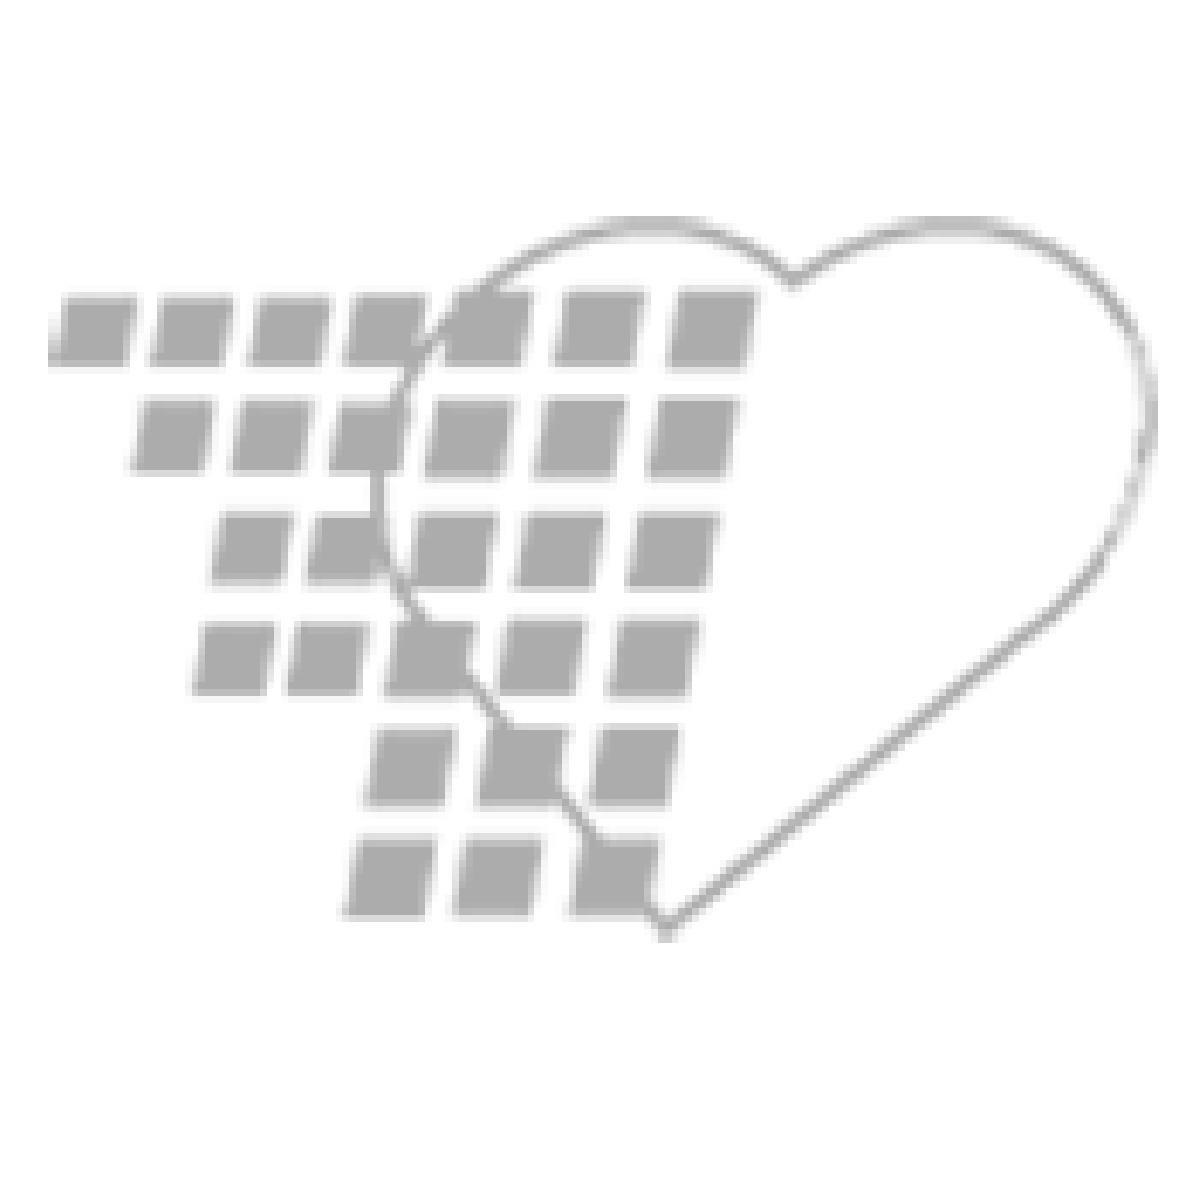 11-81-9230 Gaumard Advanced Patient Care Male and Female Catheterization Simulator